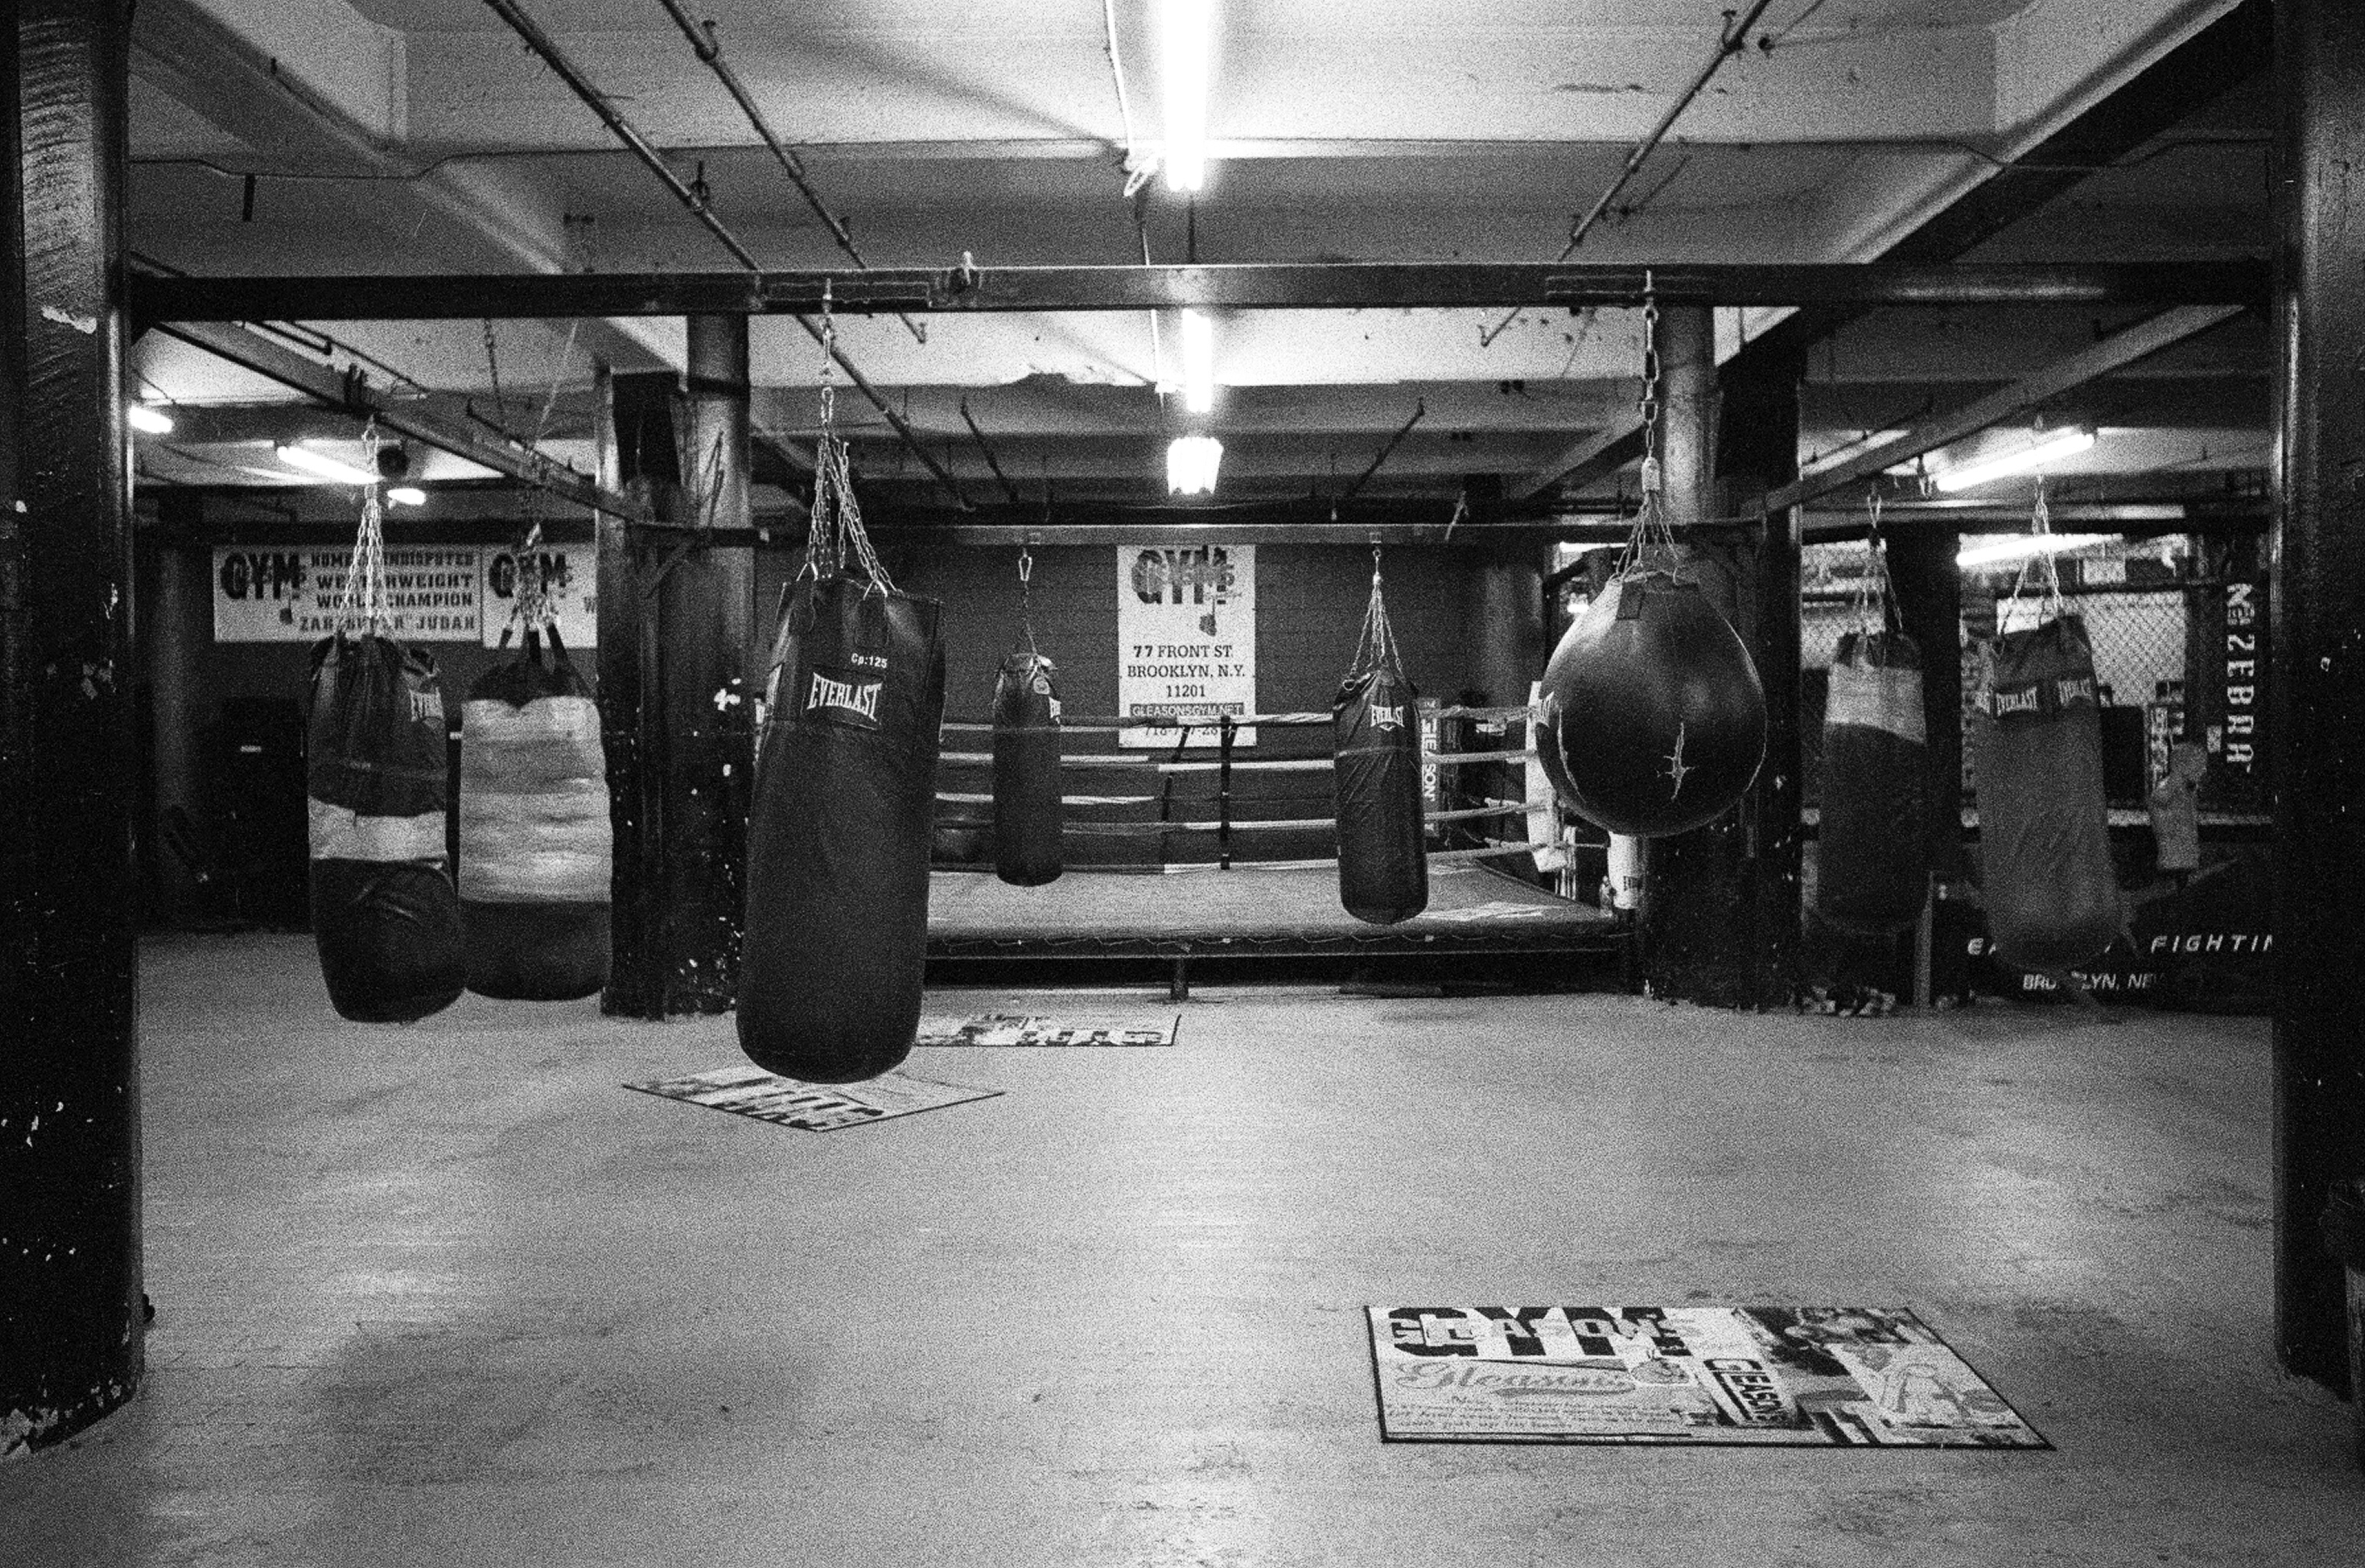 Boxing Gym Wallpaper - WallpaperSafari